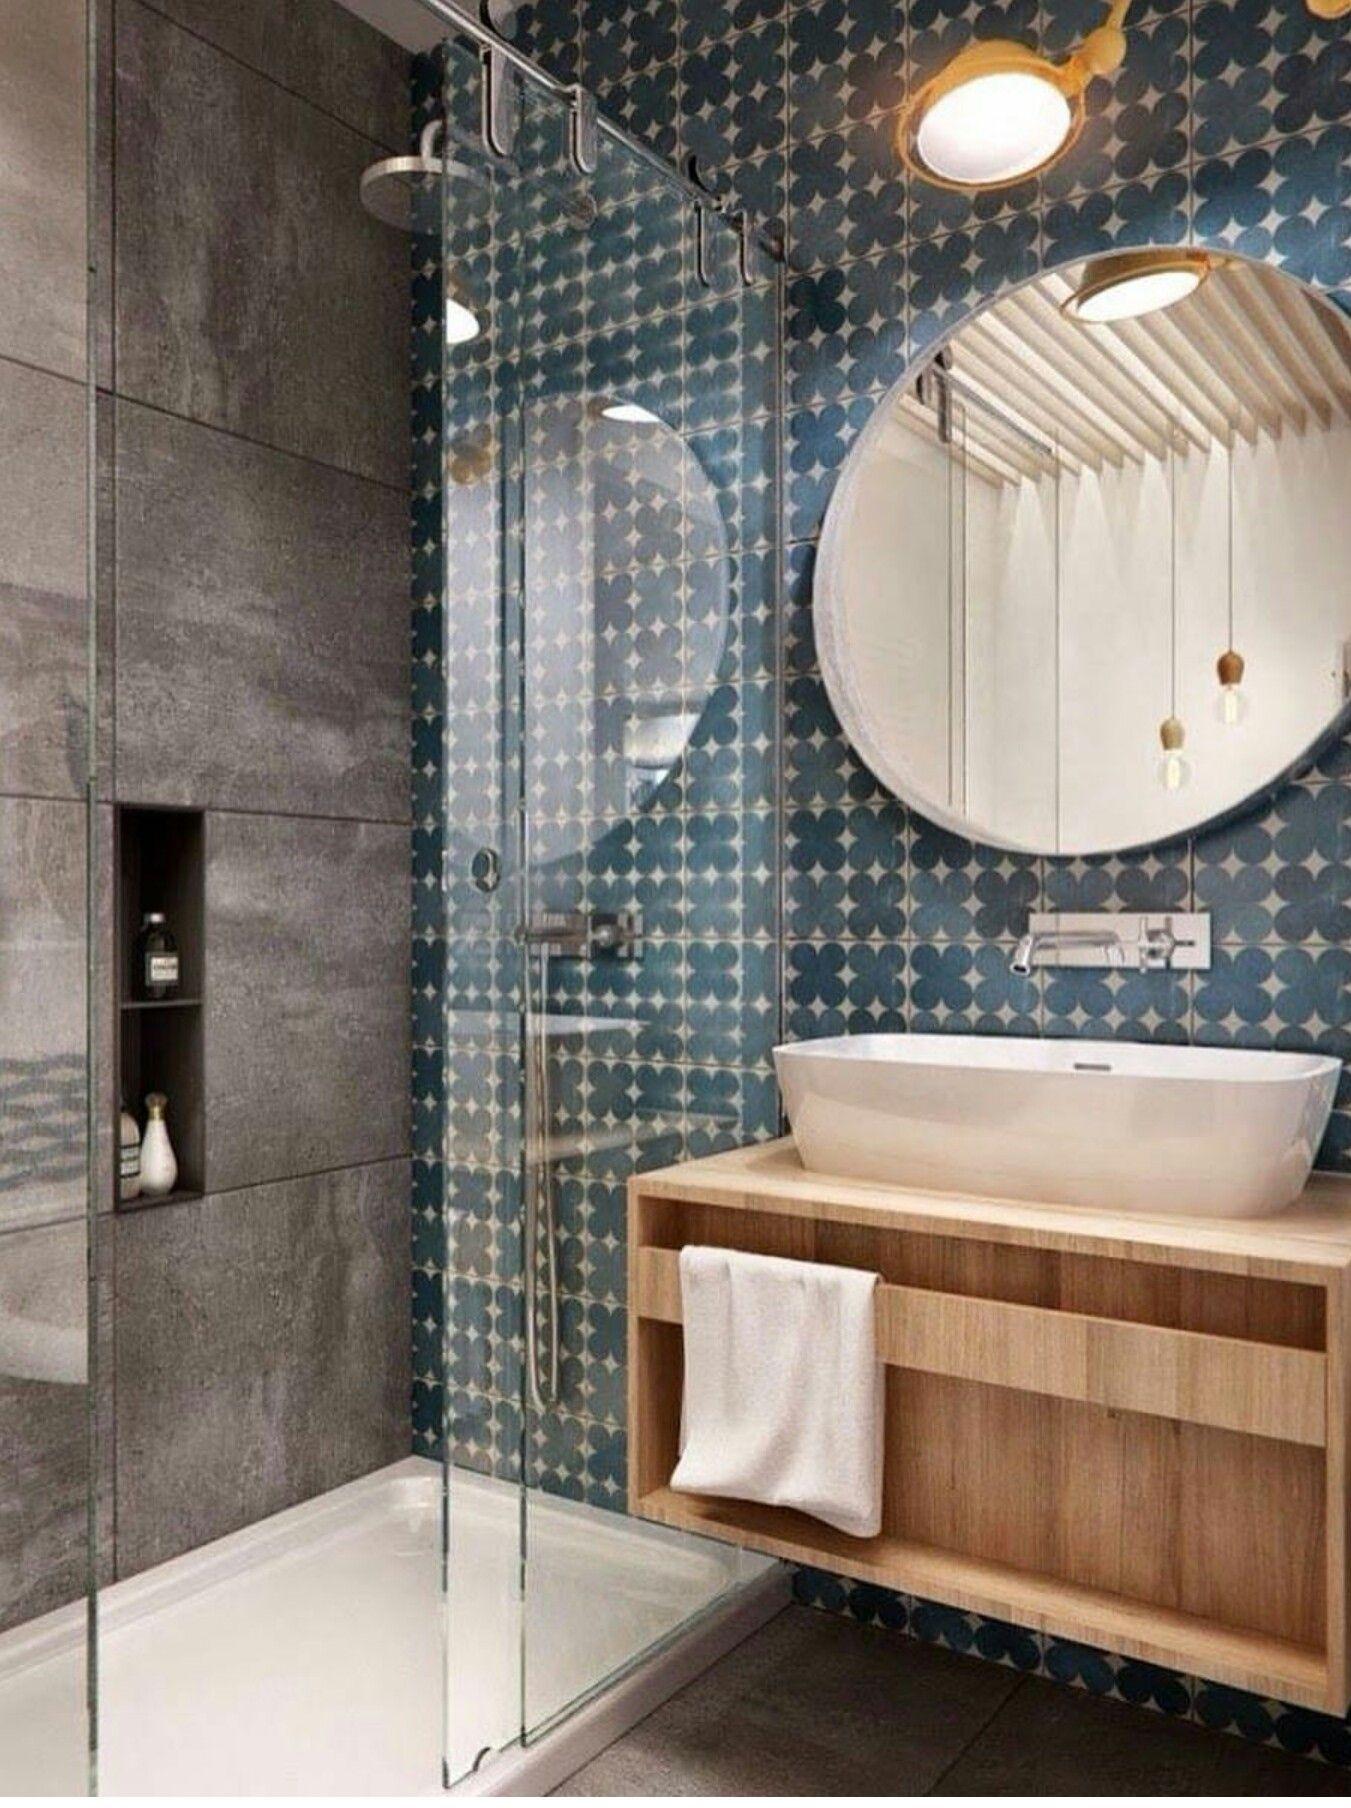 Epingle Par Ansari Zahid Sur Bathroom Deco Salle De Bain Salle